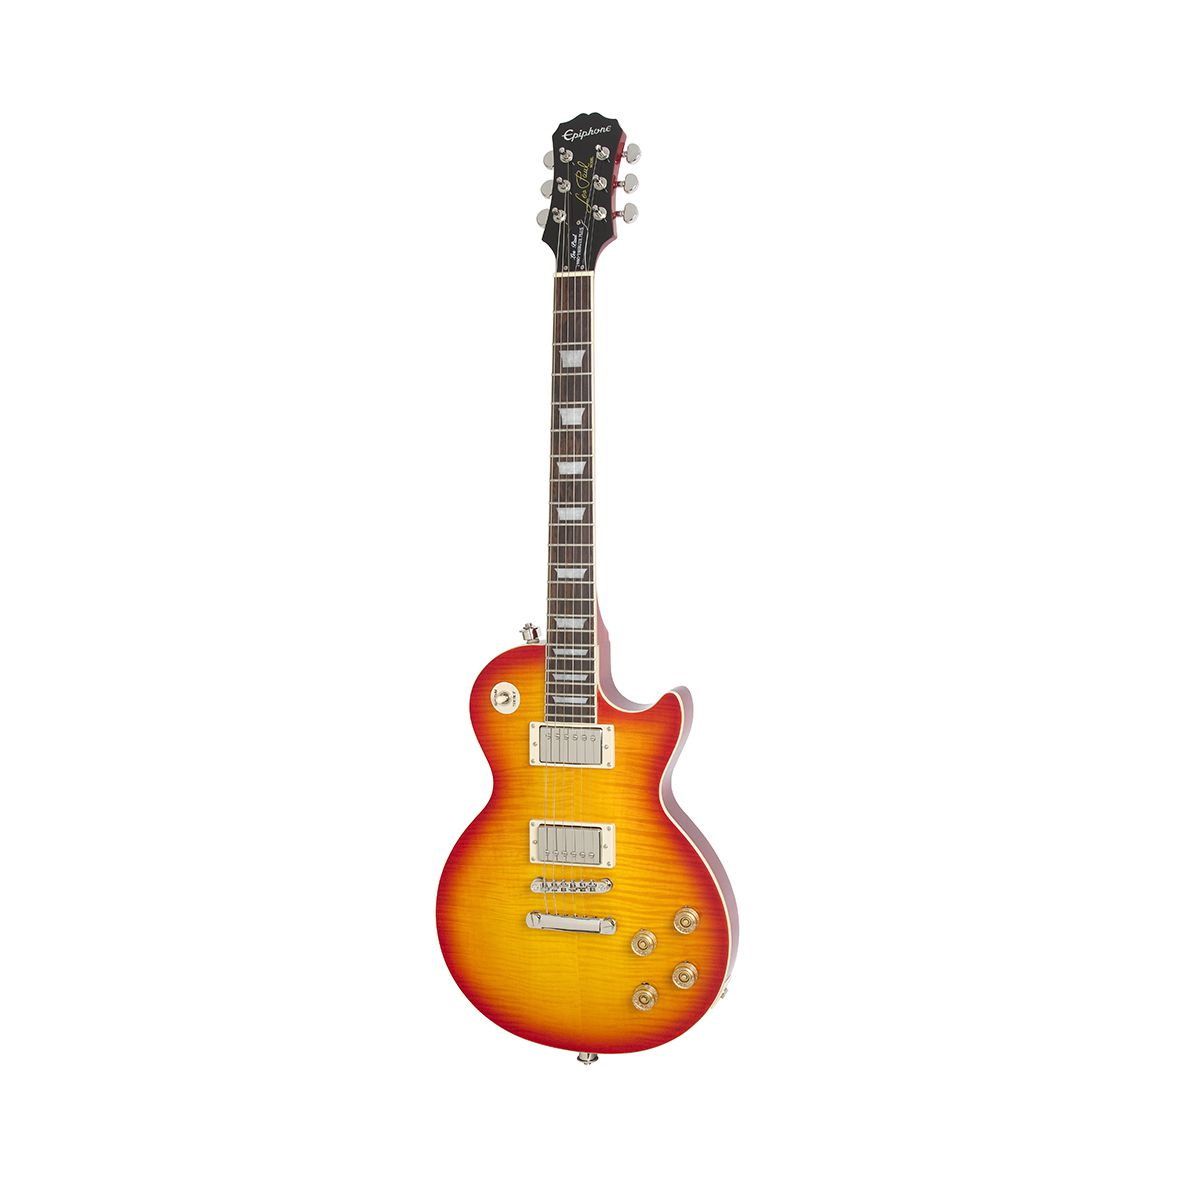 Guitarra Epiphone Les Paul Standard Tribute 1960 Outfit